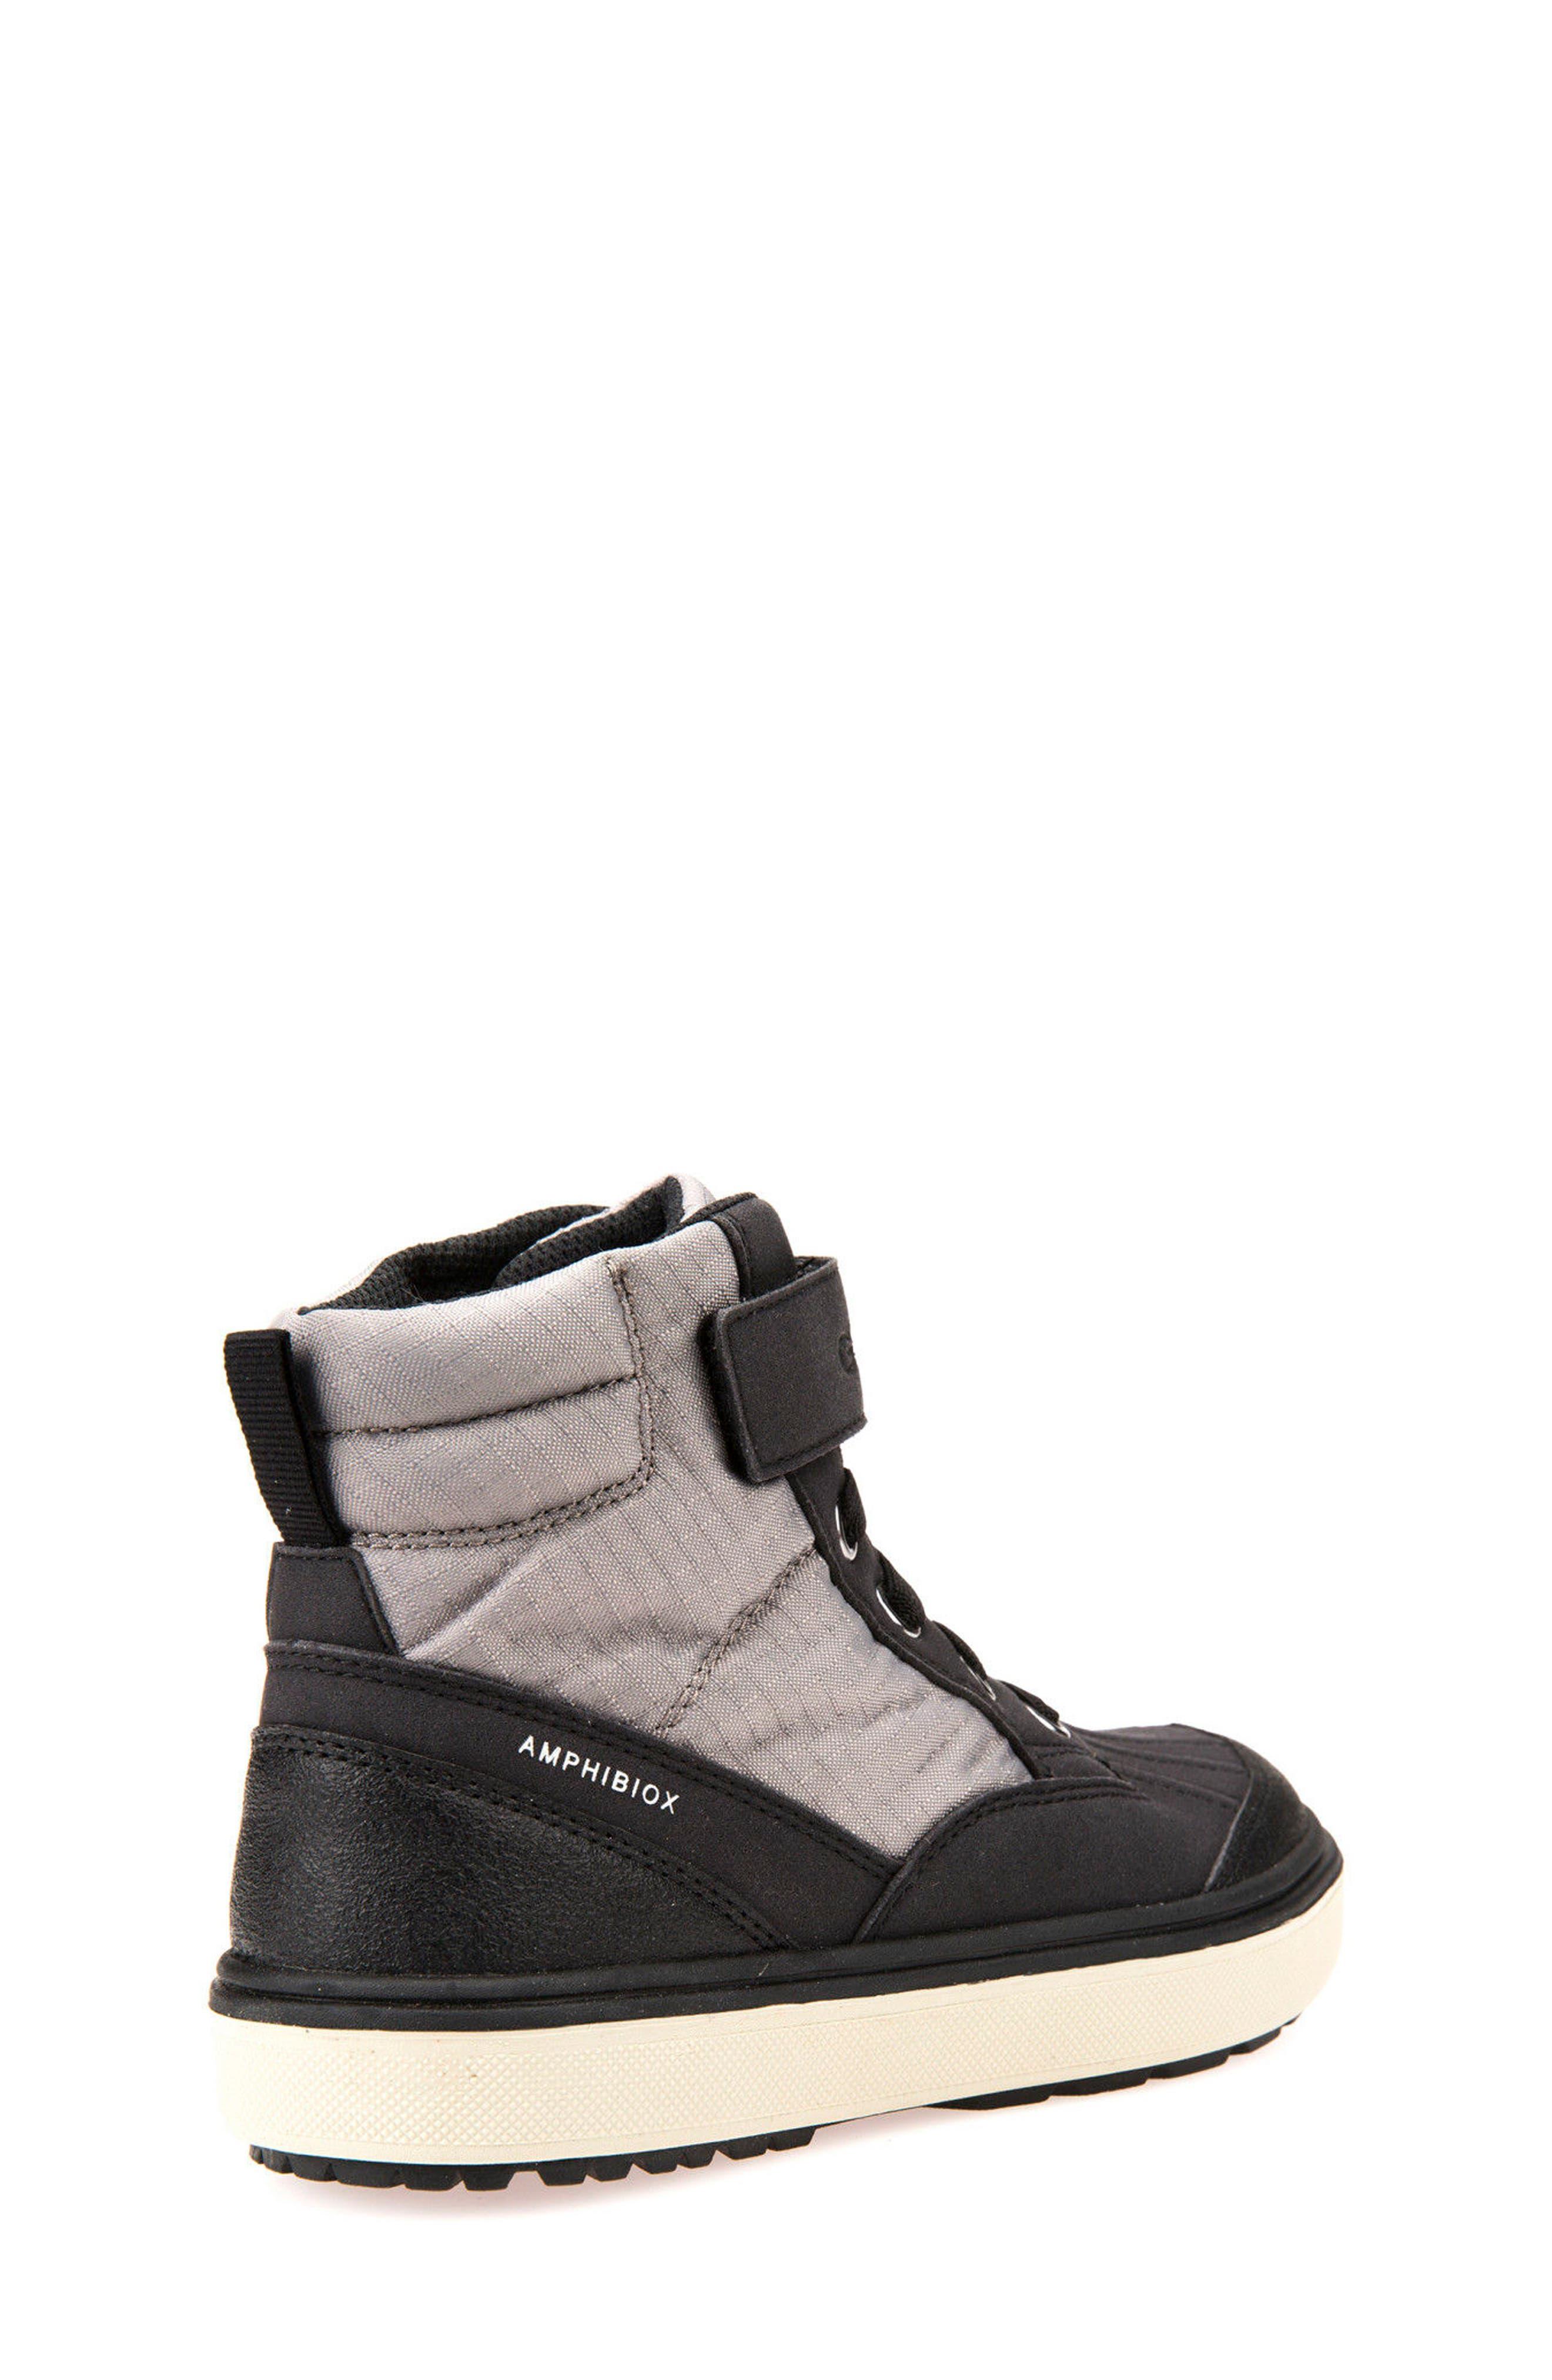 'Mattias - ABX' Amphibiox<sup>®</sup> Waterproof Sneaker,                             Alternate thumbnail 2, color,                             061